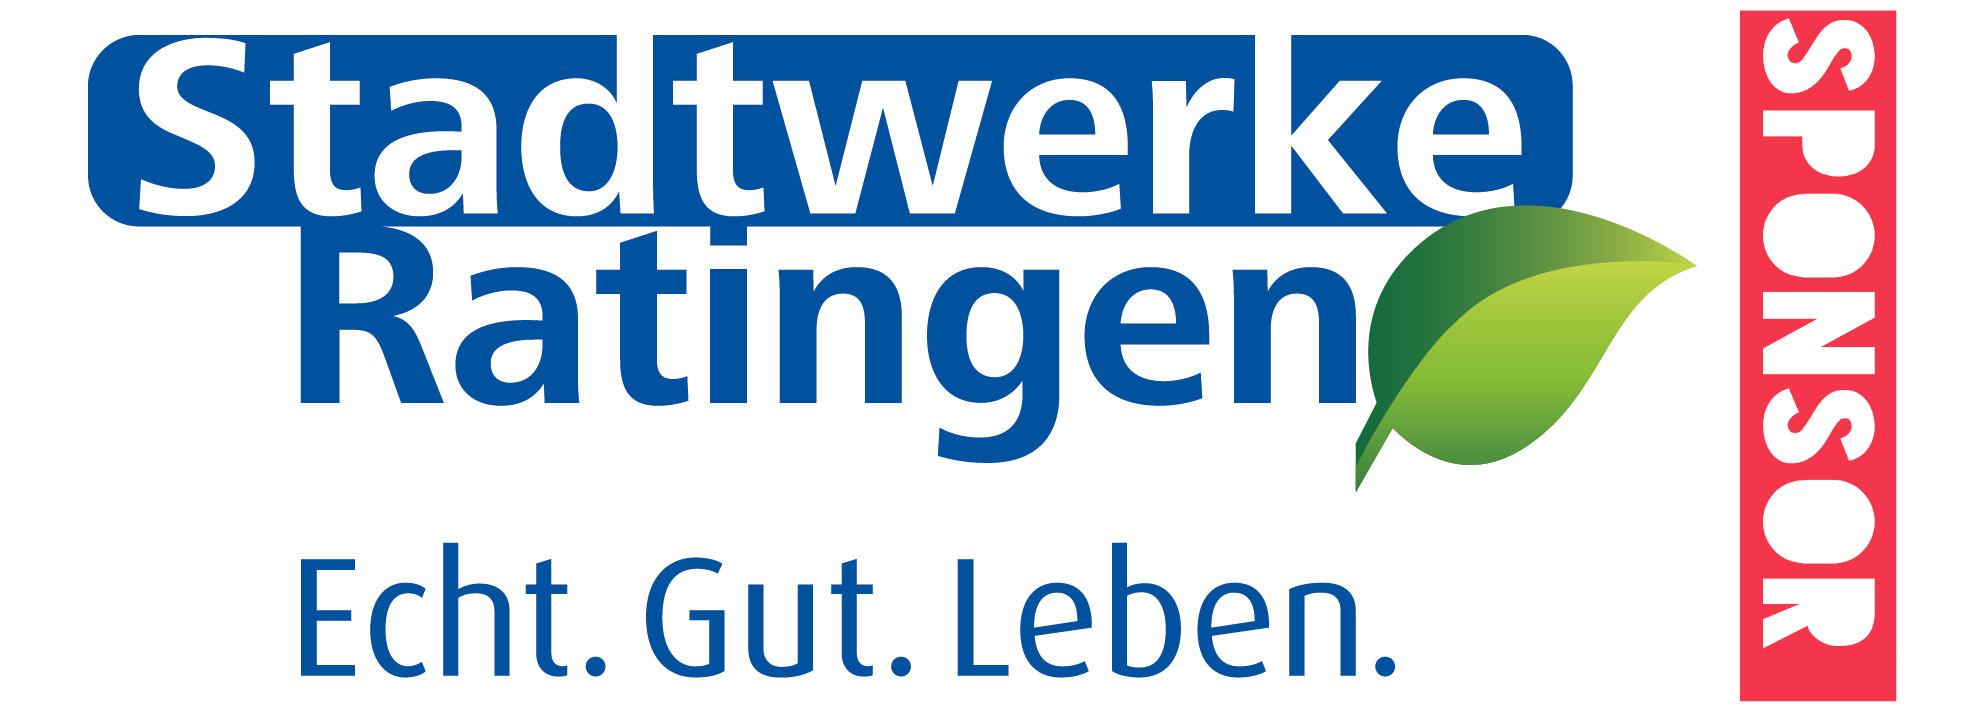 jugendkulturjahr-2020-ratingen-StreetArtMap-Sponsor-Stadtwerke